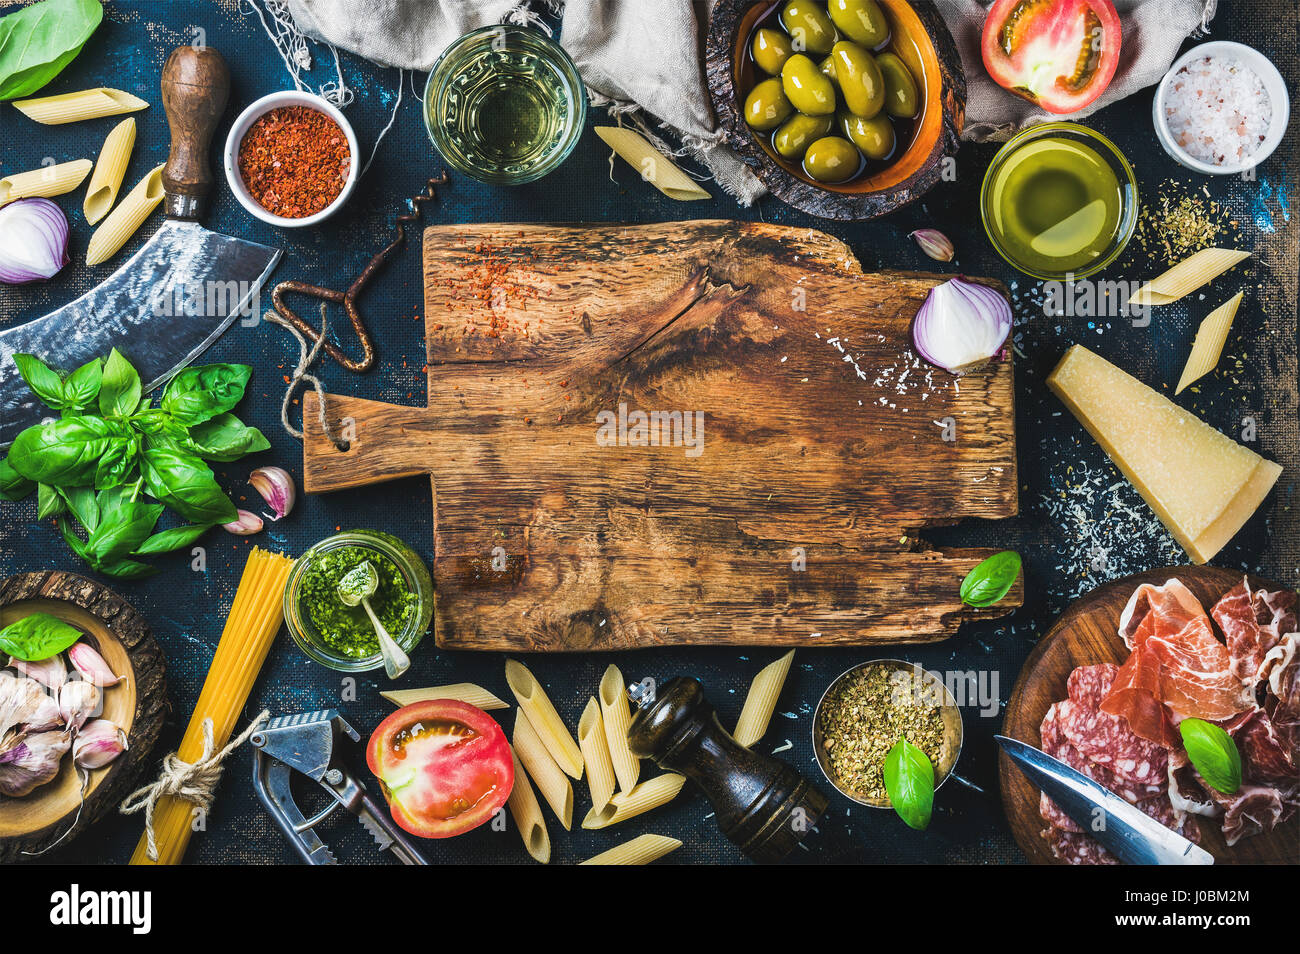 Italian food cooking ingredients on dark background - Stock Image